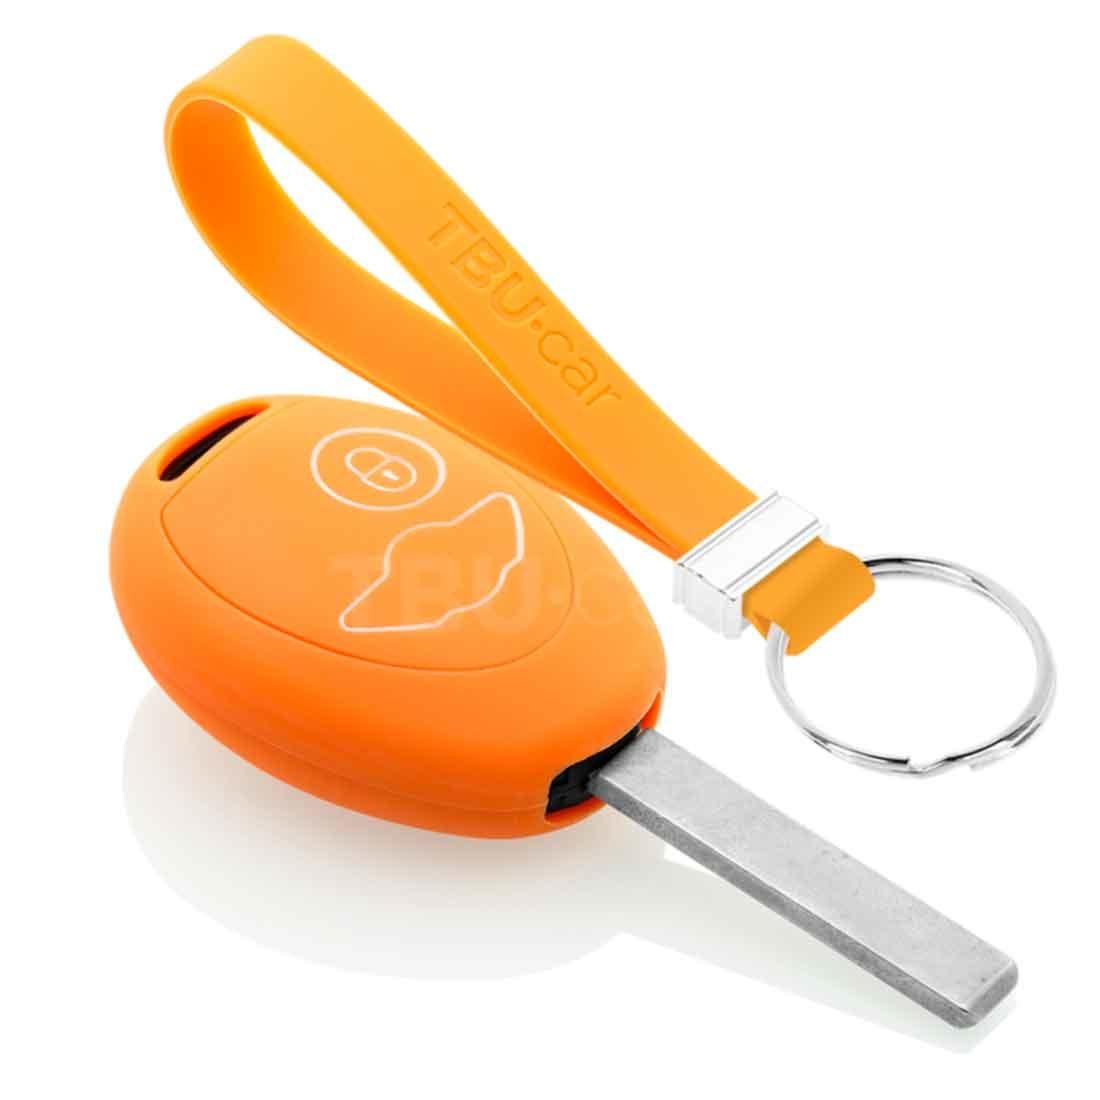 TBU car TBU car Sleutel cover compatibel met Mini - Silicone sleutelhoesje - beschermhoesje autosleutel - Oranje